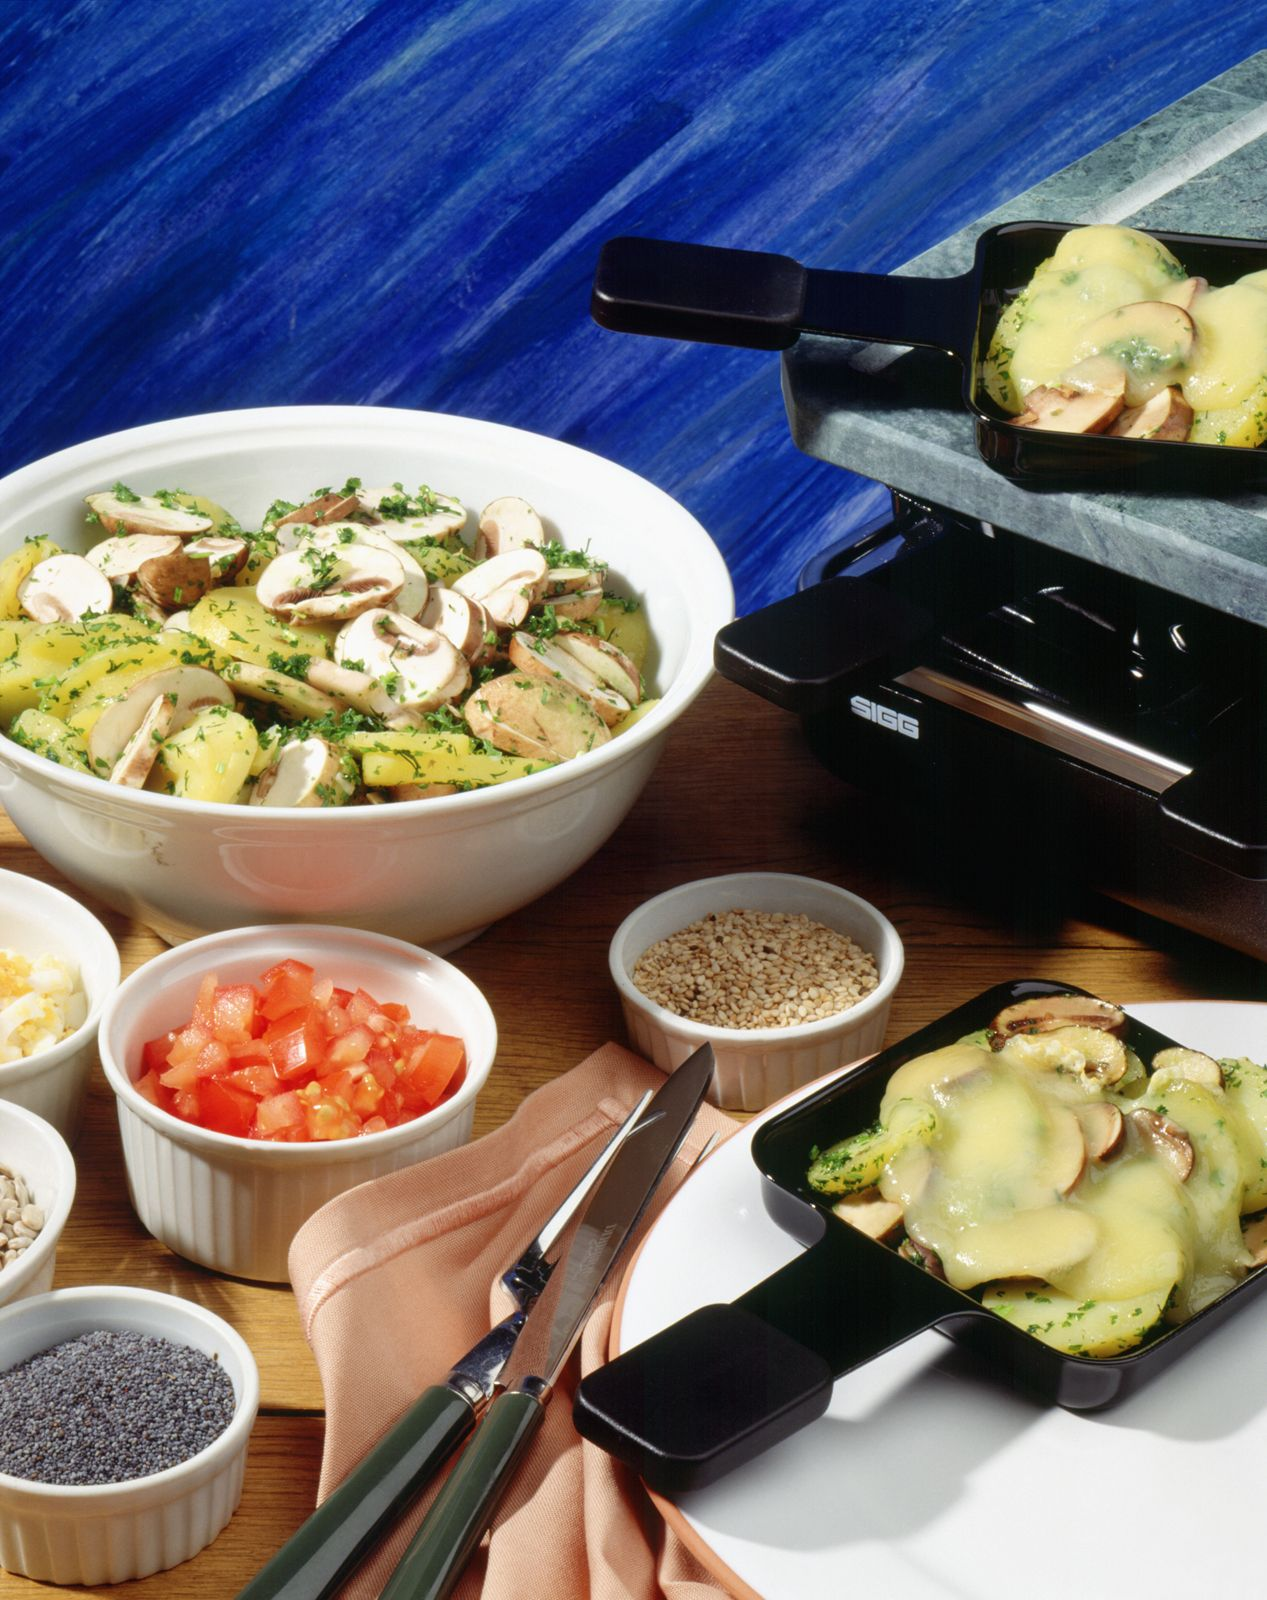 Kartoffel Kcal buntes kartoffel pilz raclette rezept raclette ideen pilze und